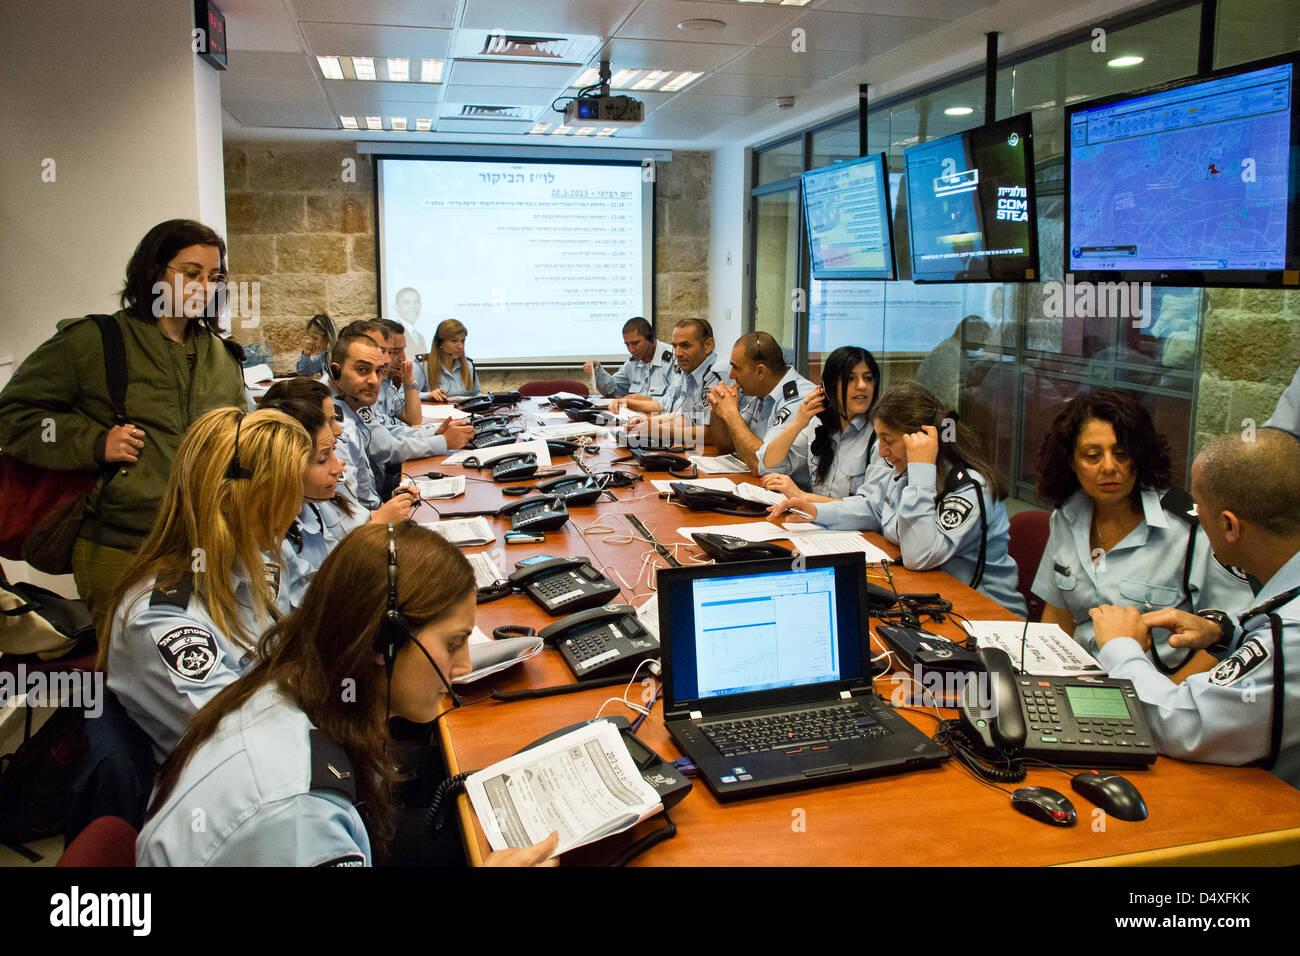 Twenty police officers staff the Jerusalem Police District Information Center set up to provide citizens with information - Stock Image